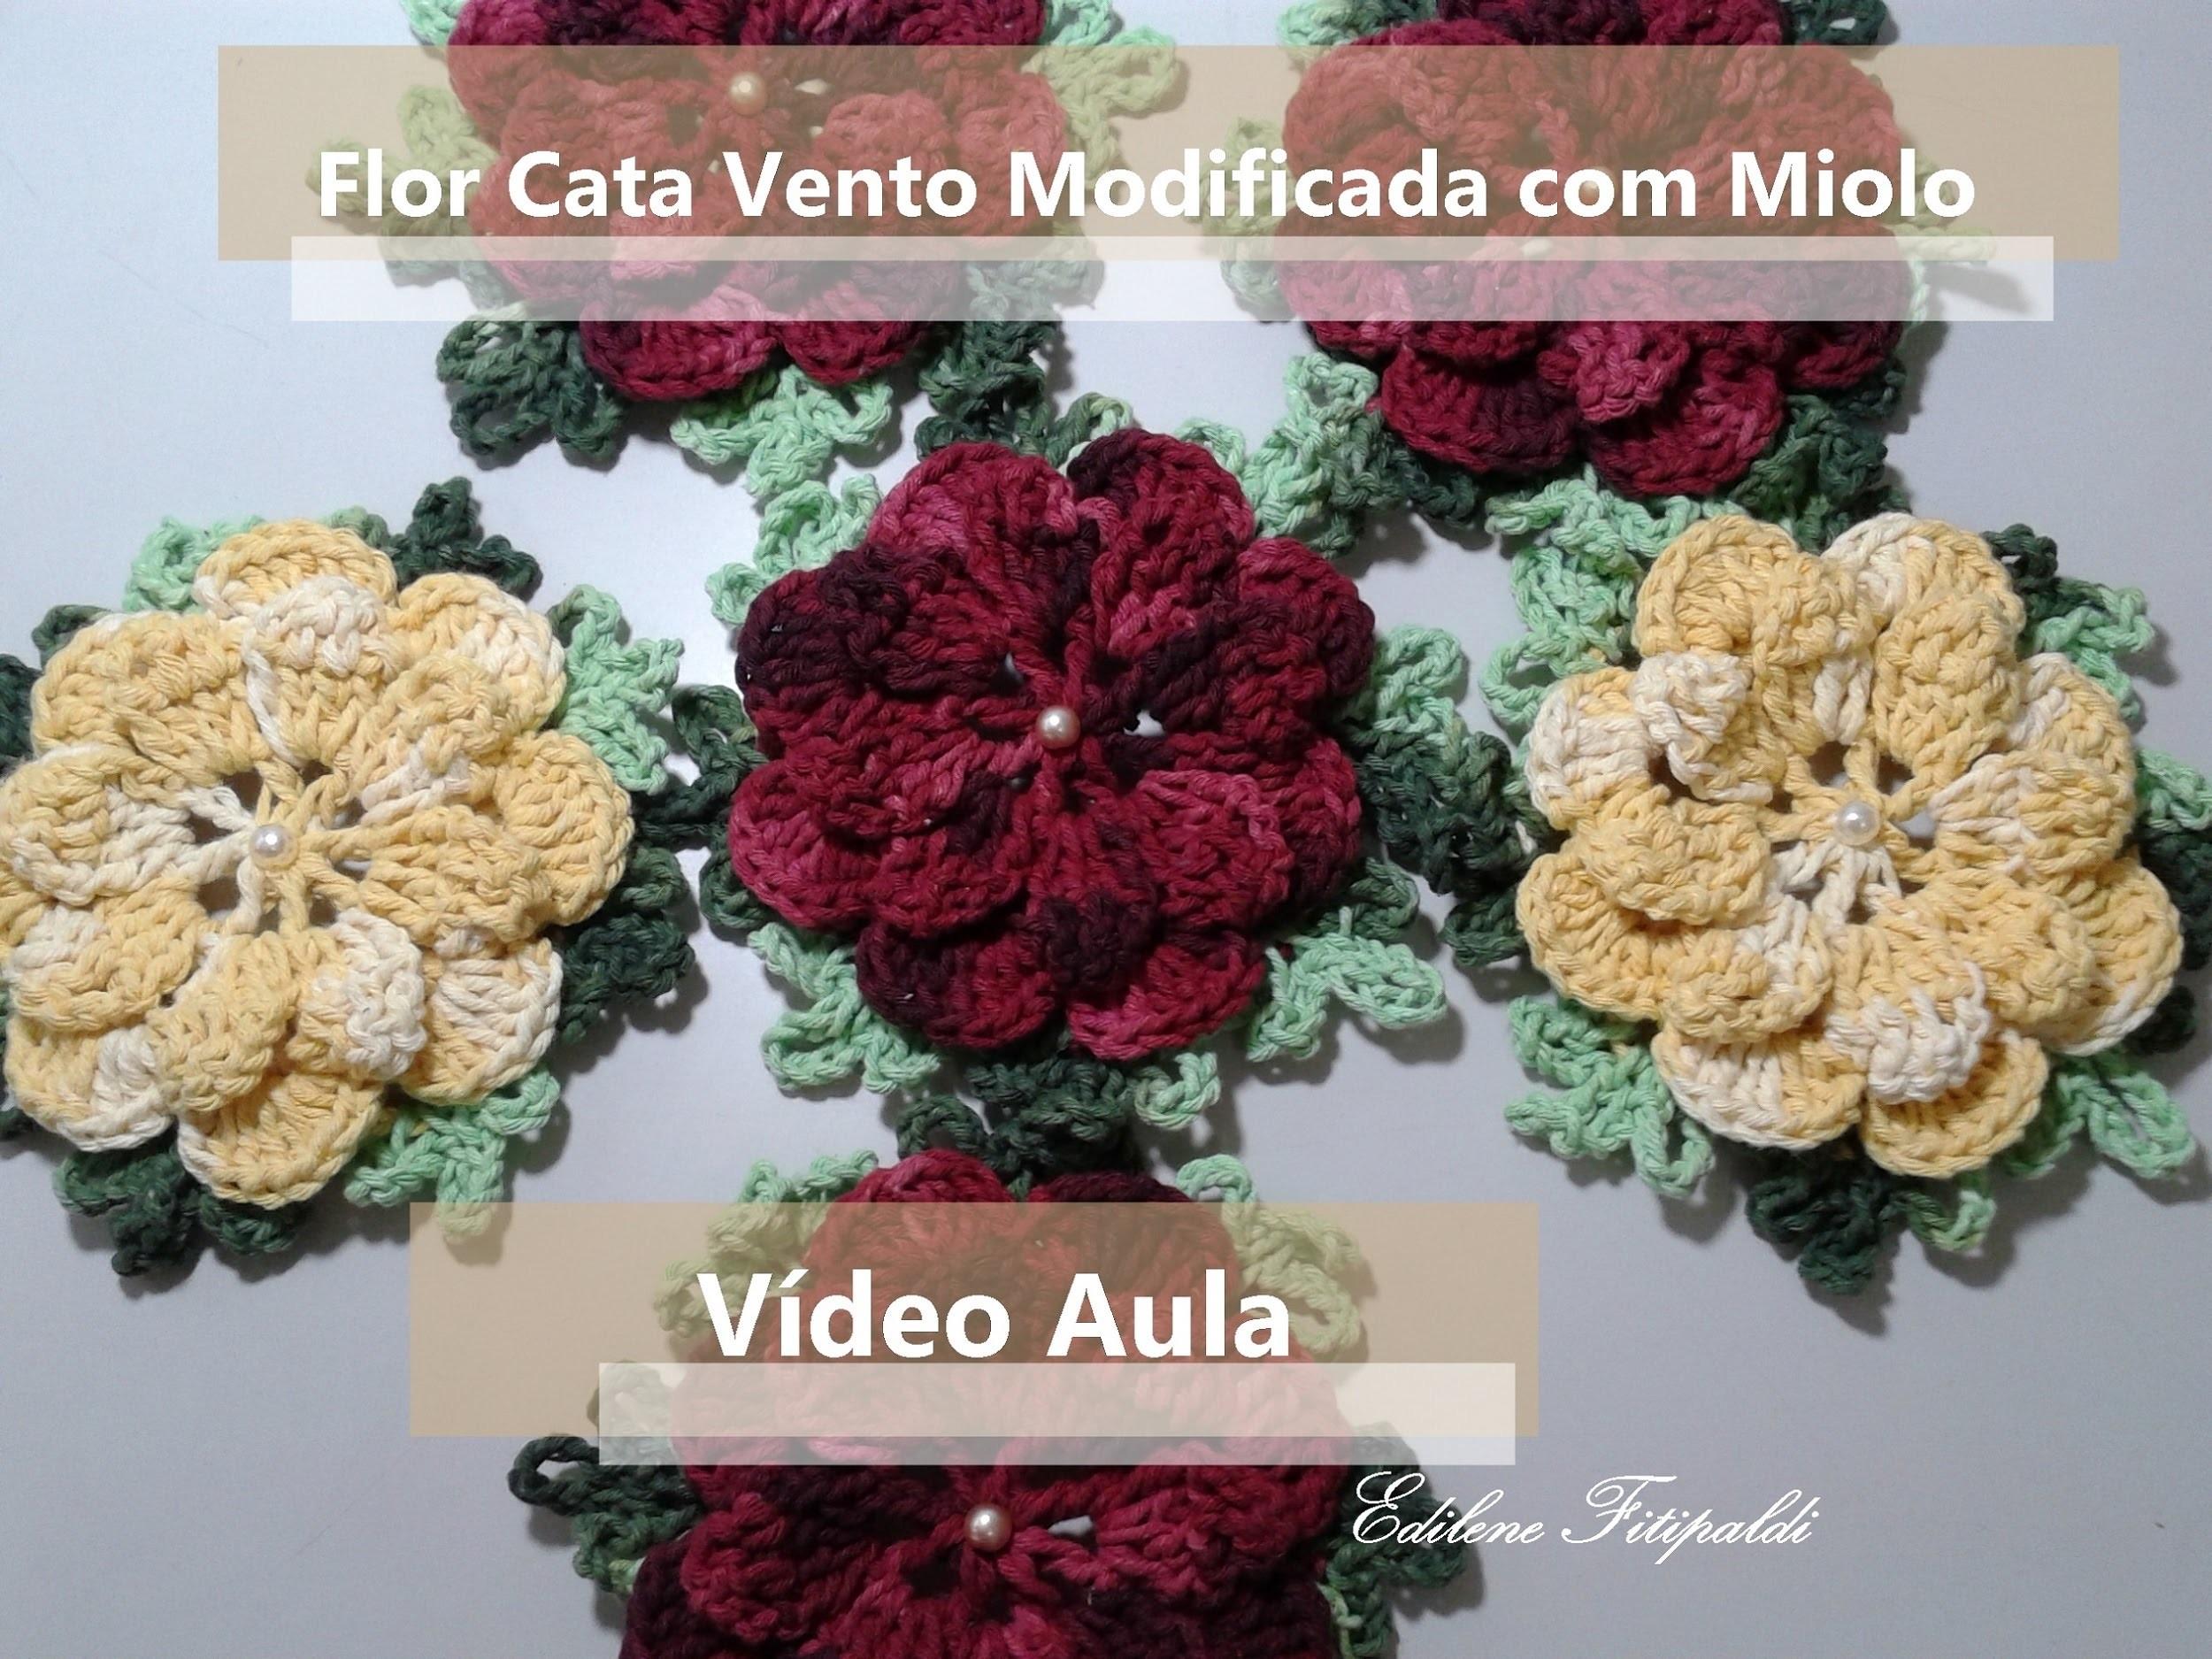 Flor Cata Vento Modificada com Miolo